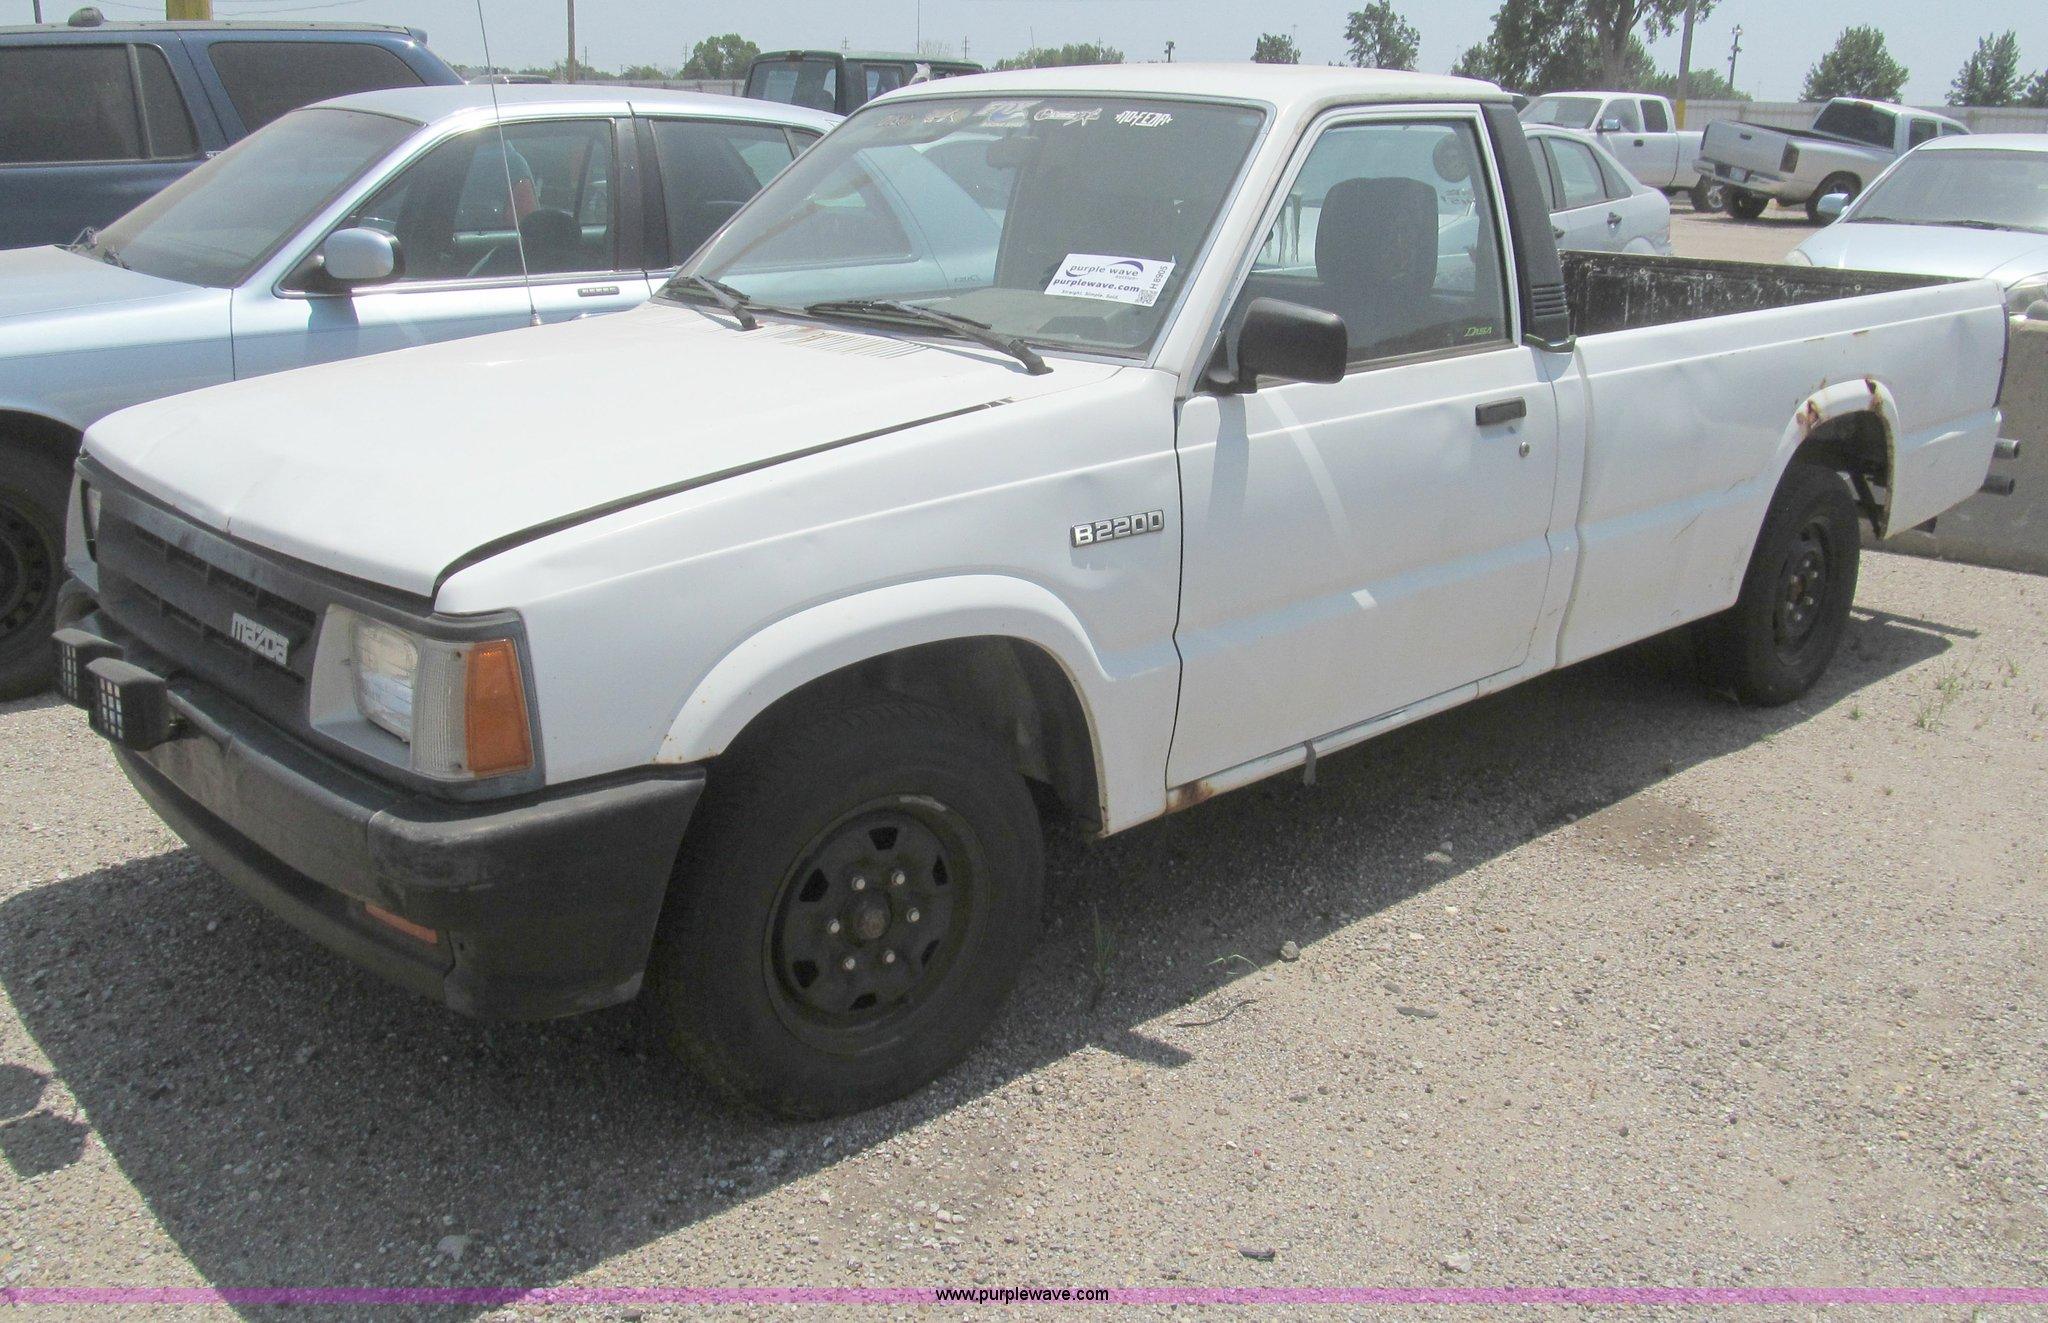 1993 Mazda B2200 pickup truck | Item H8905 | SOLD! August 18...